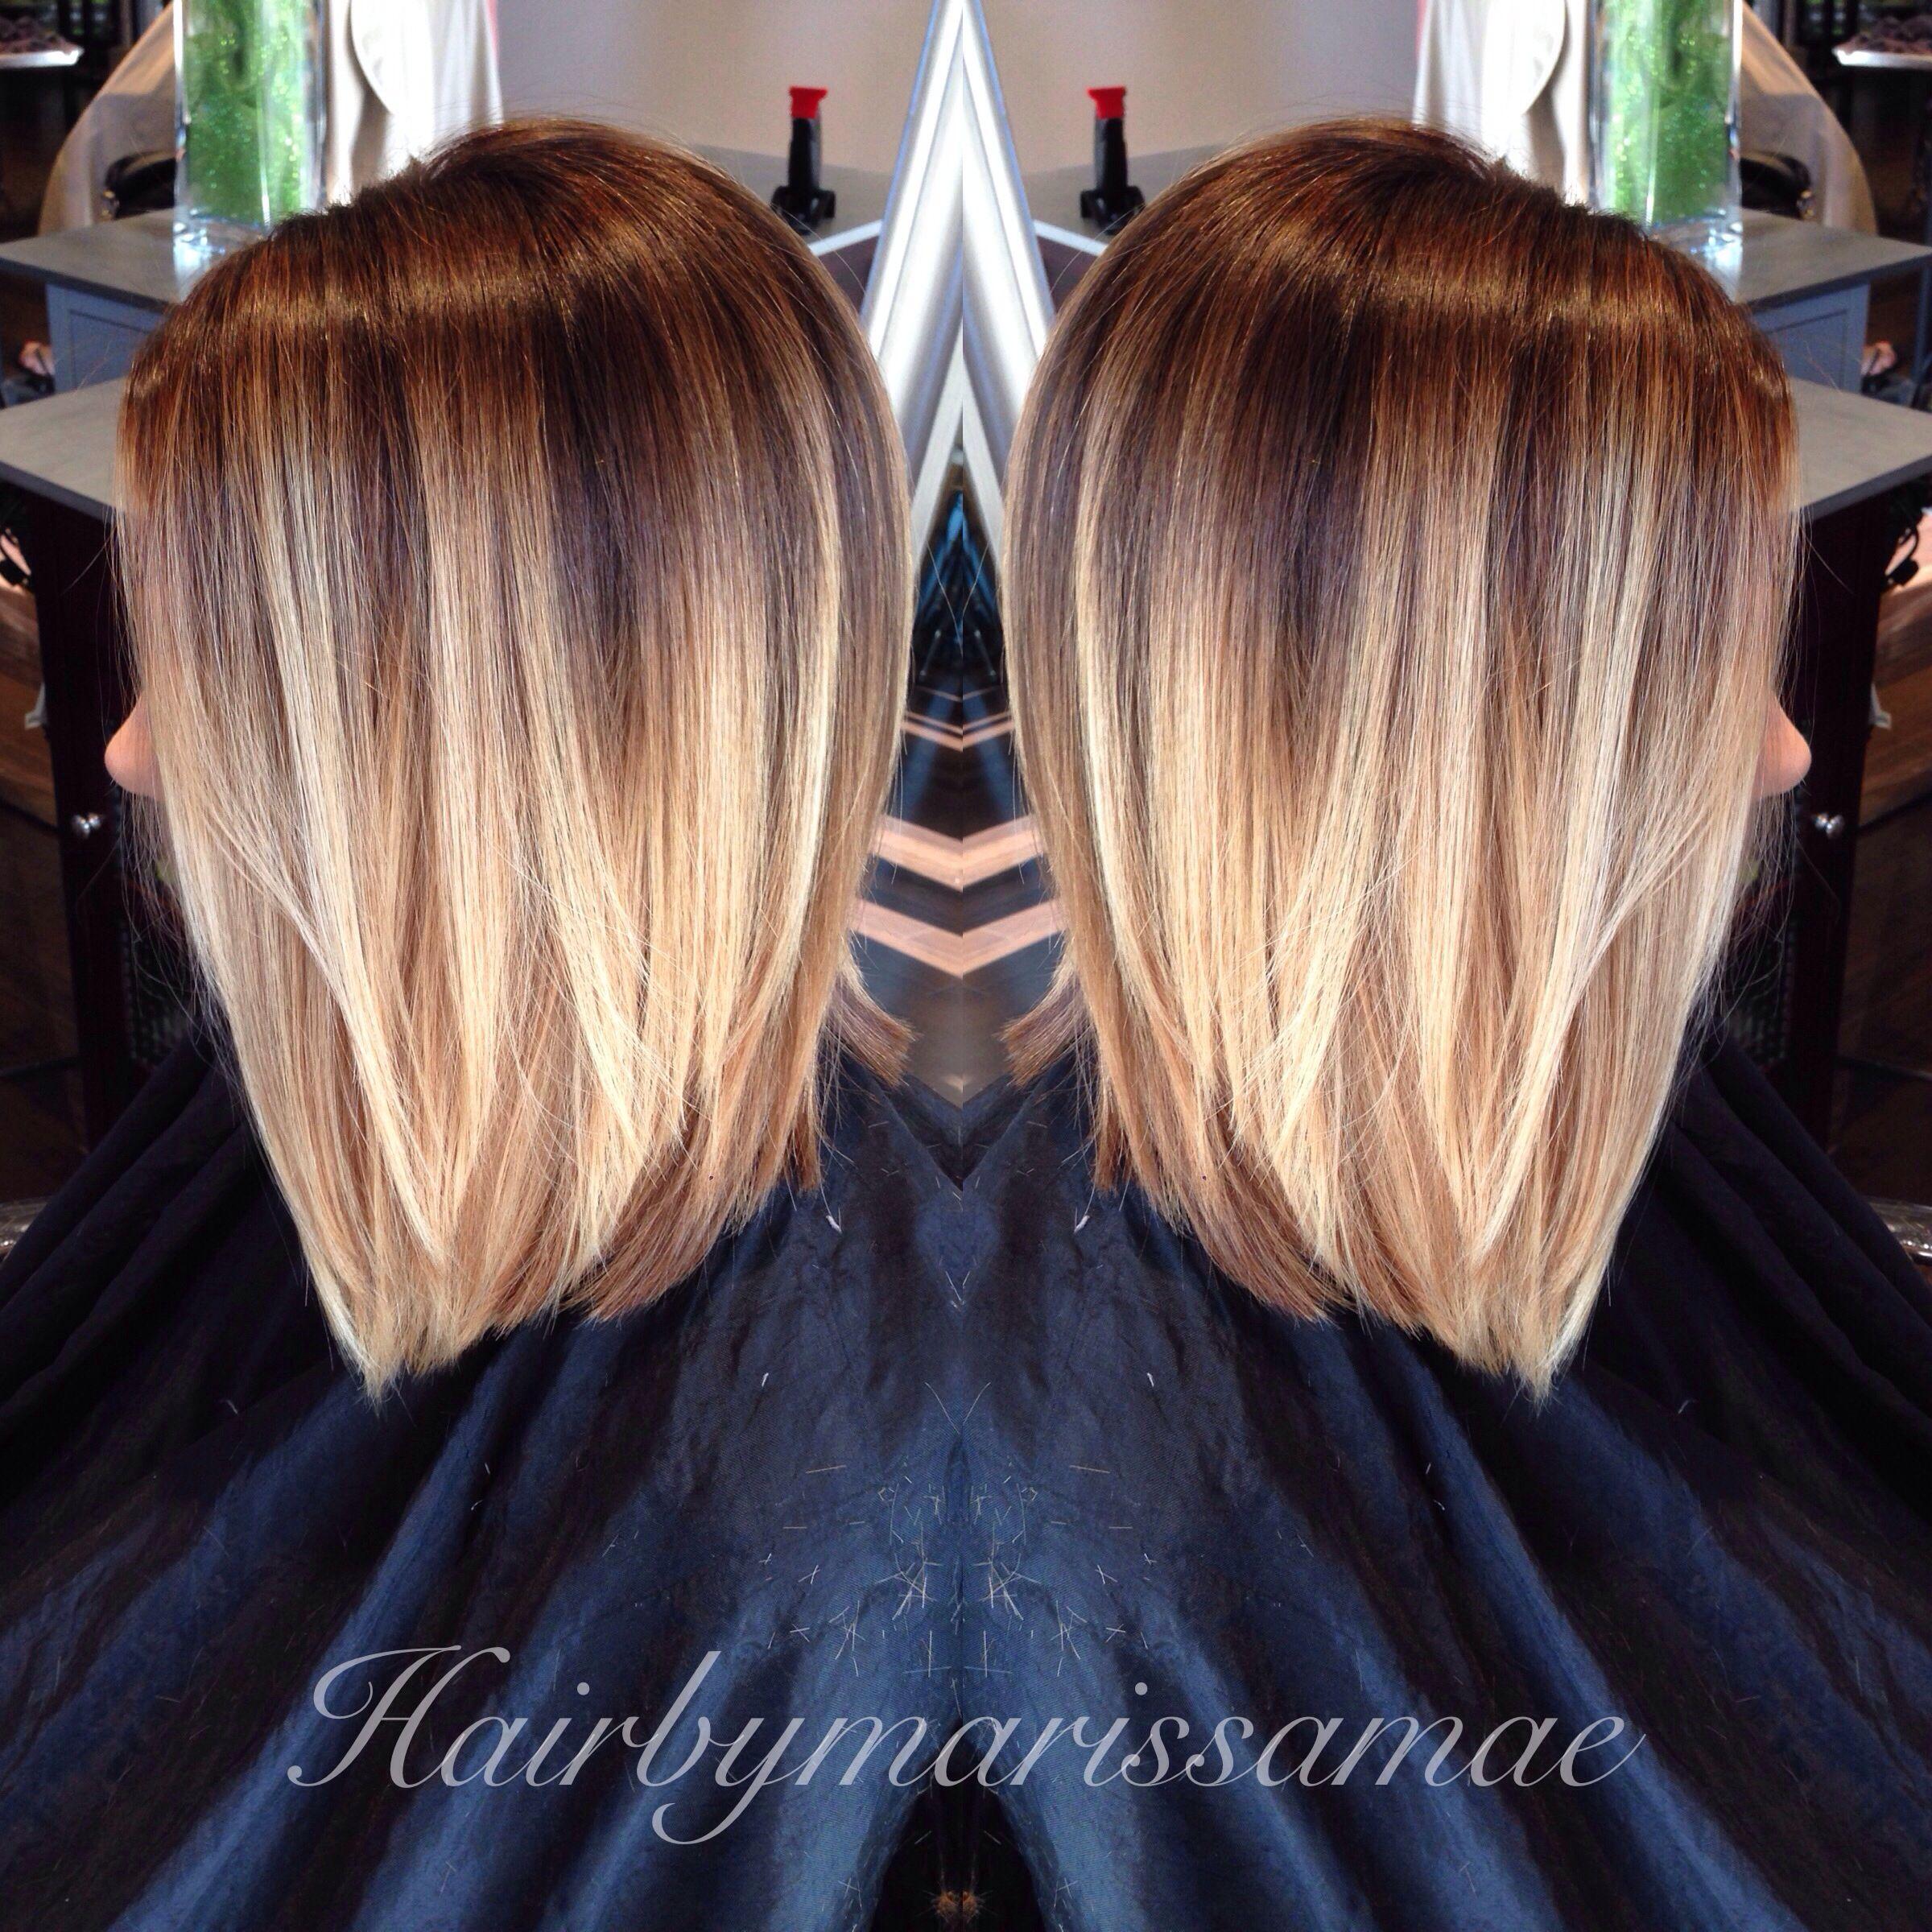 Ballayage Blond en ce qui concerne latest trend: blonde ombre colored short hair | blonde ombre